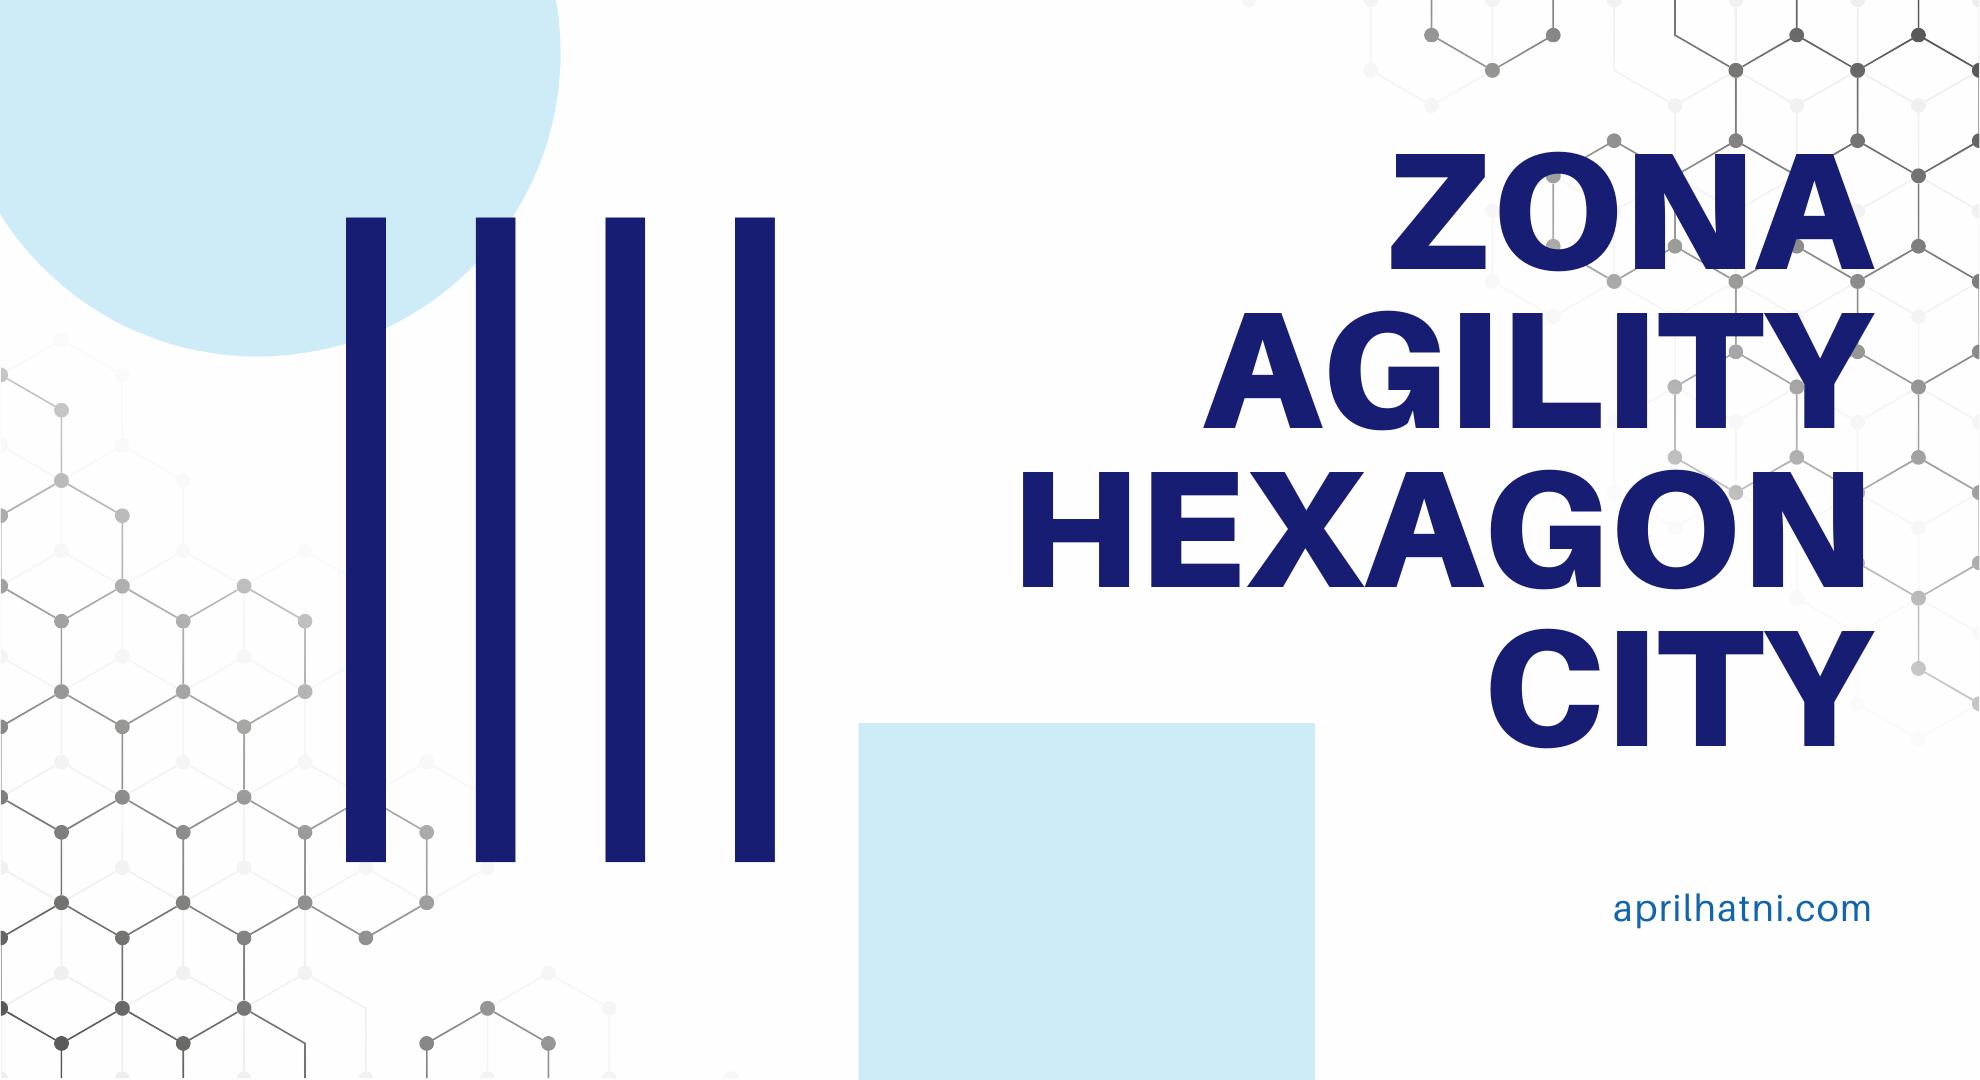 zona agility hexagon city